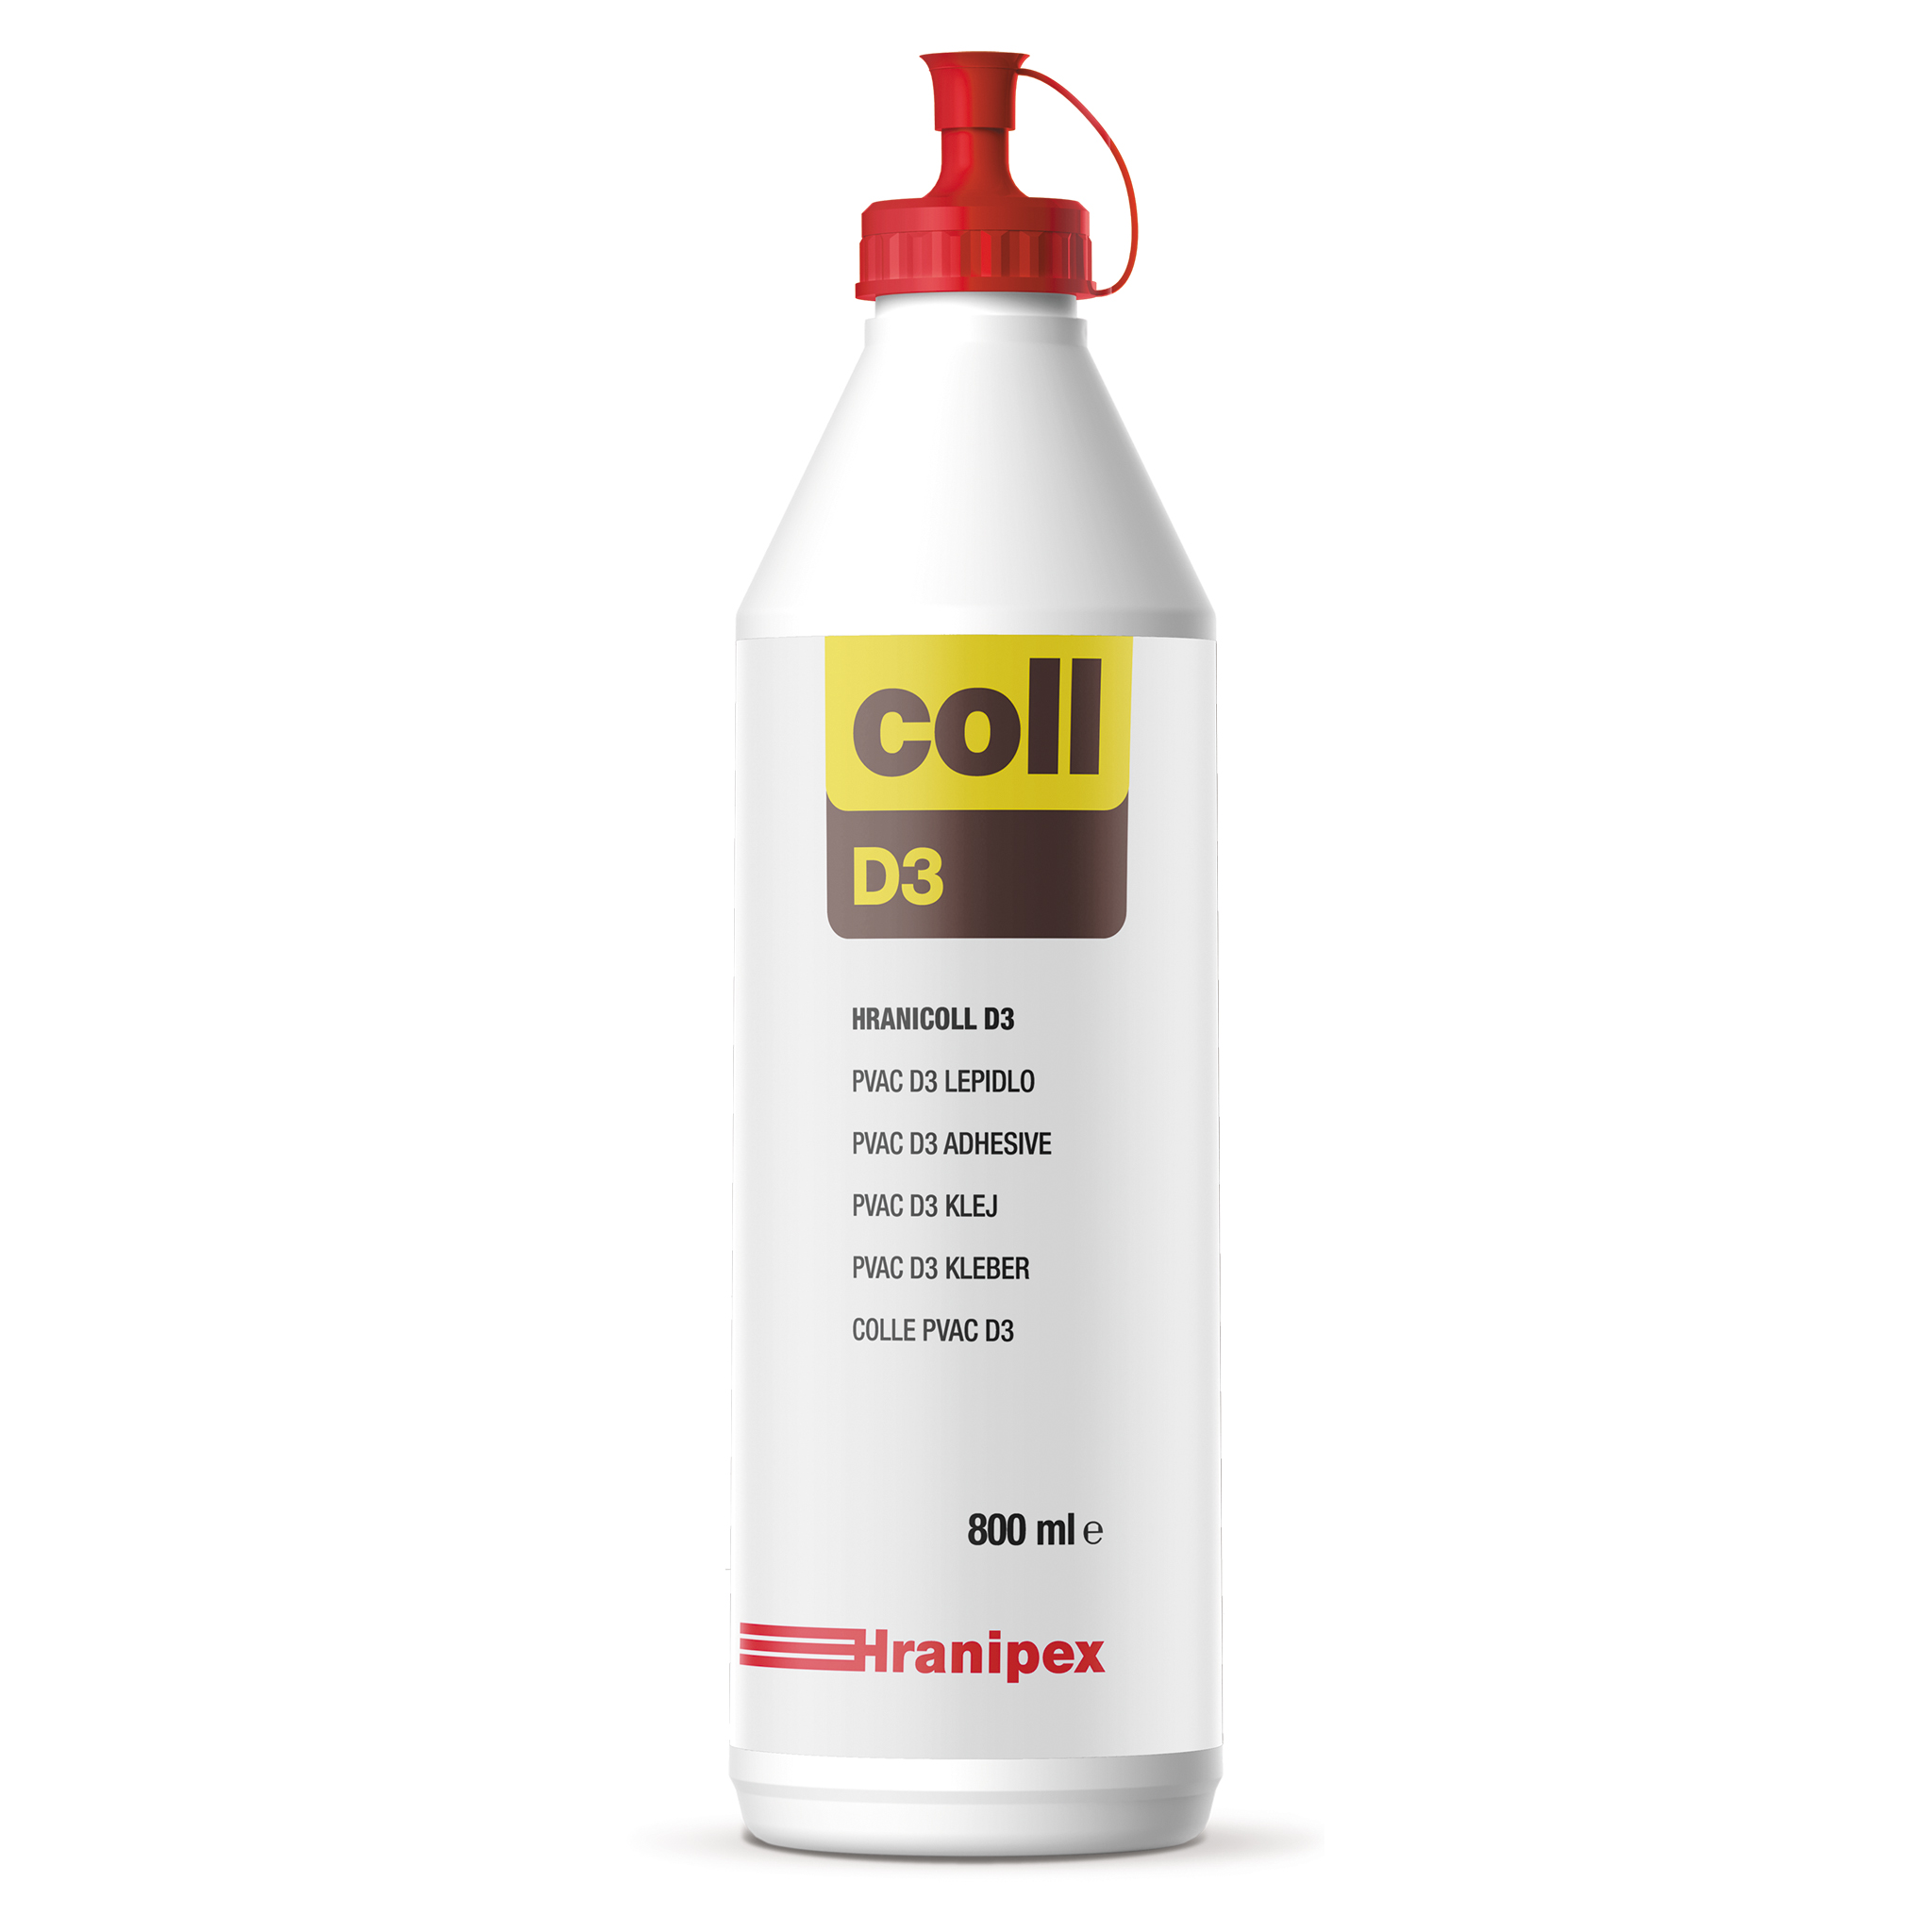 HRANICOLL D3 - PVAc Dispersive Adhesive